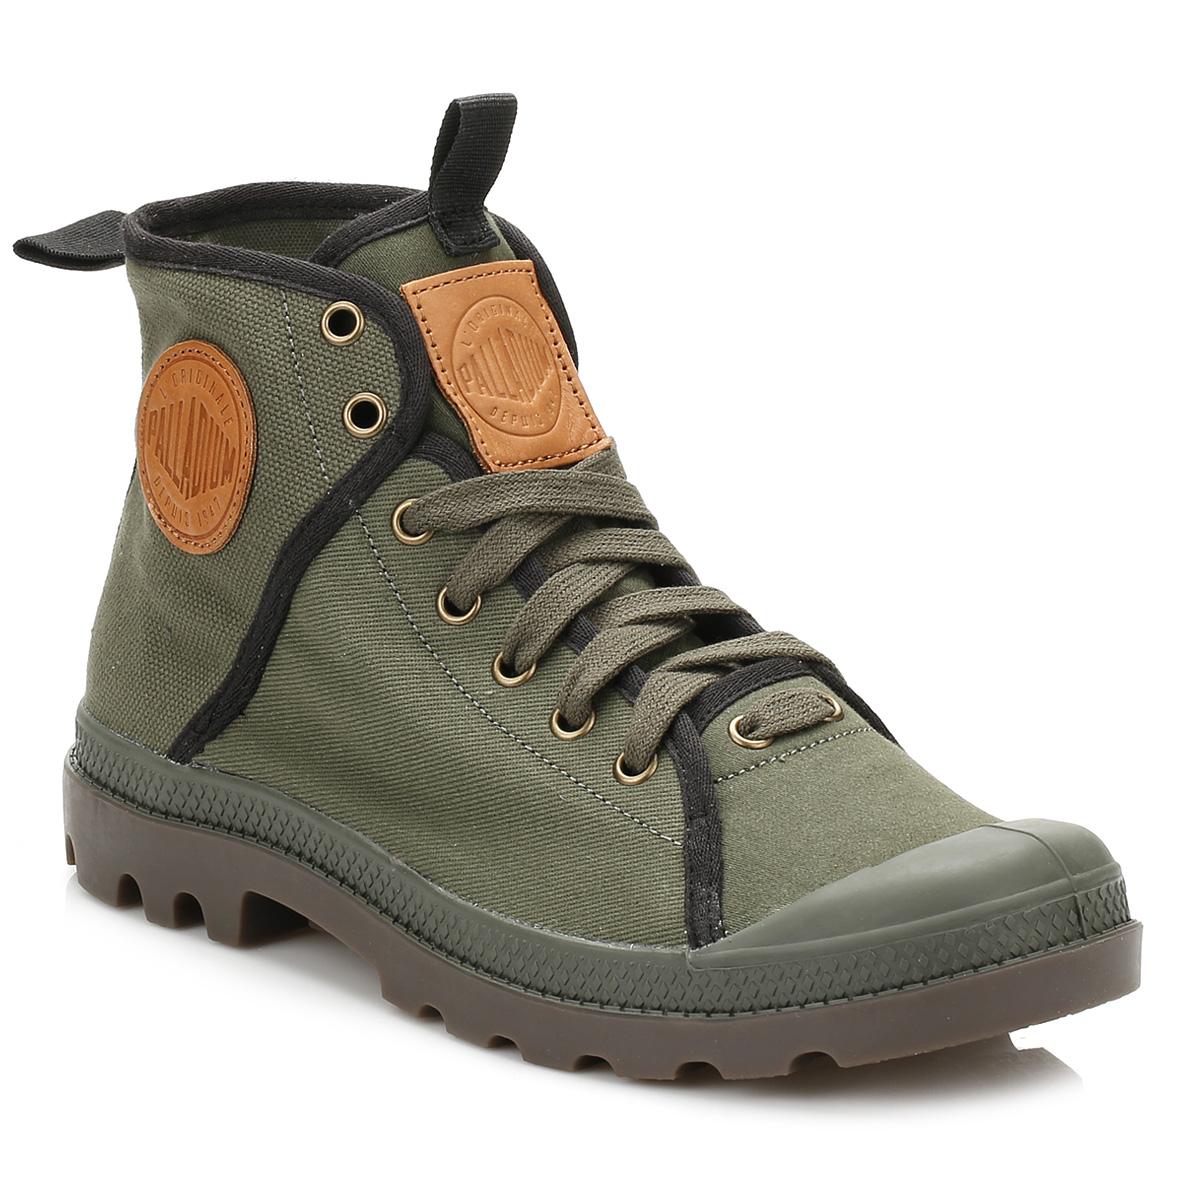 Ebay Timberland Shoes Women